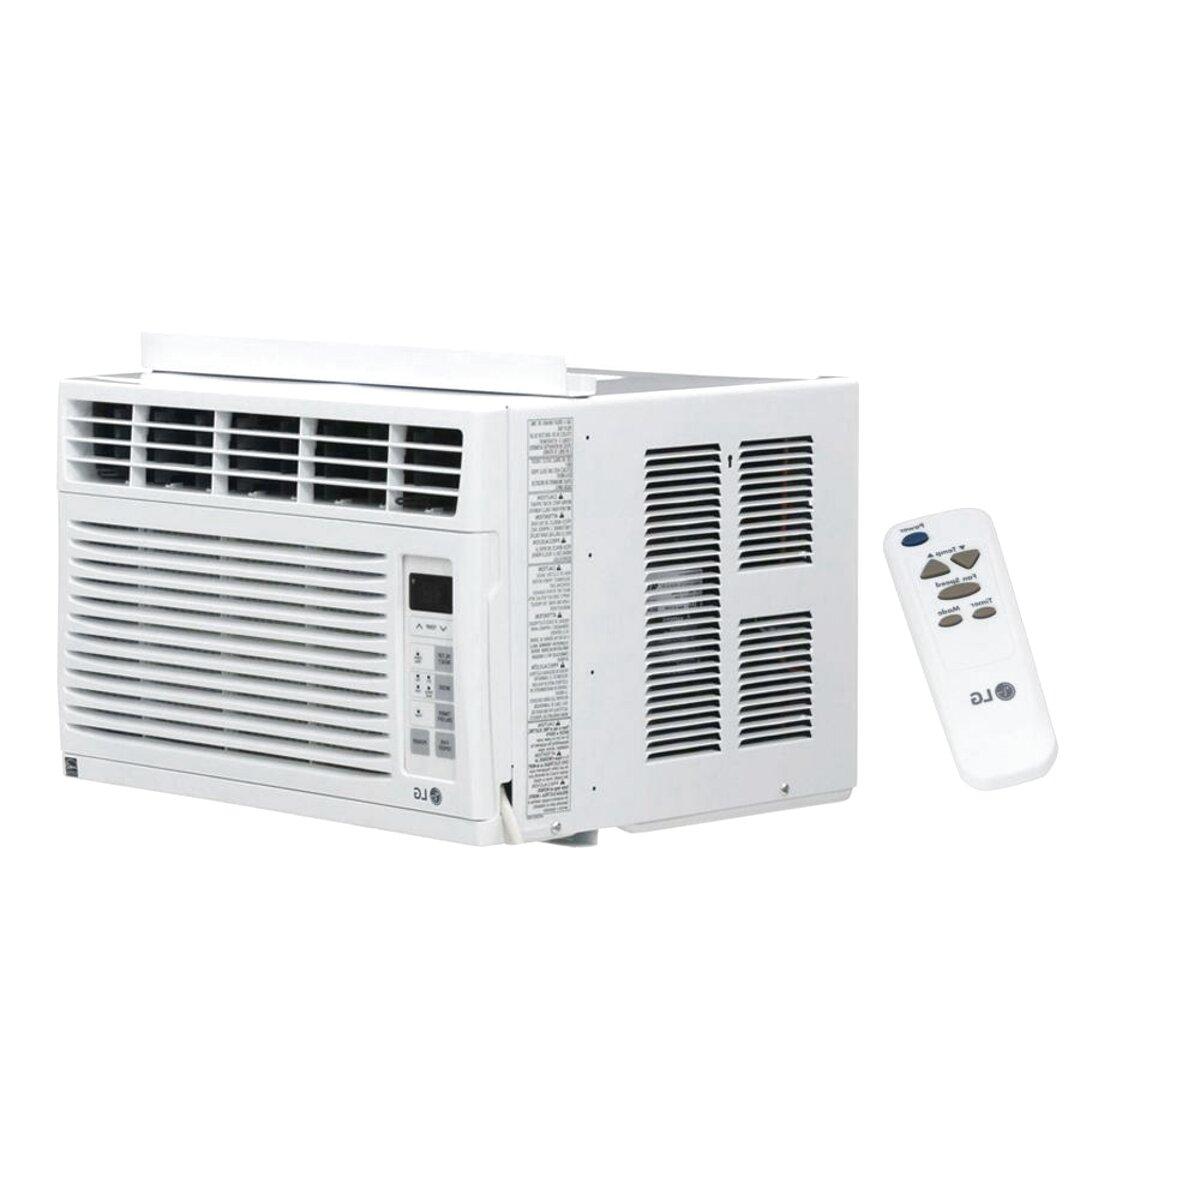 6000 btu air conditioner for sale